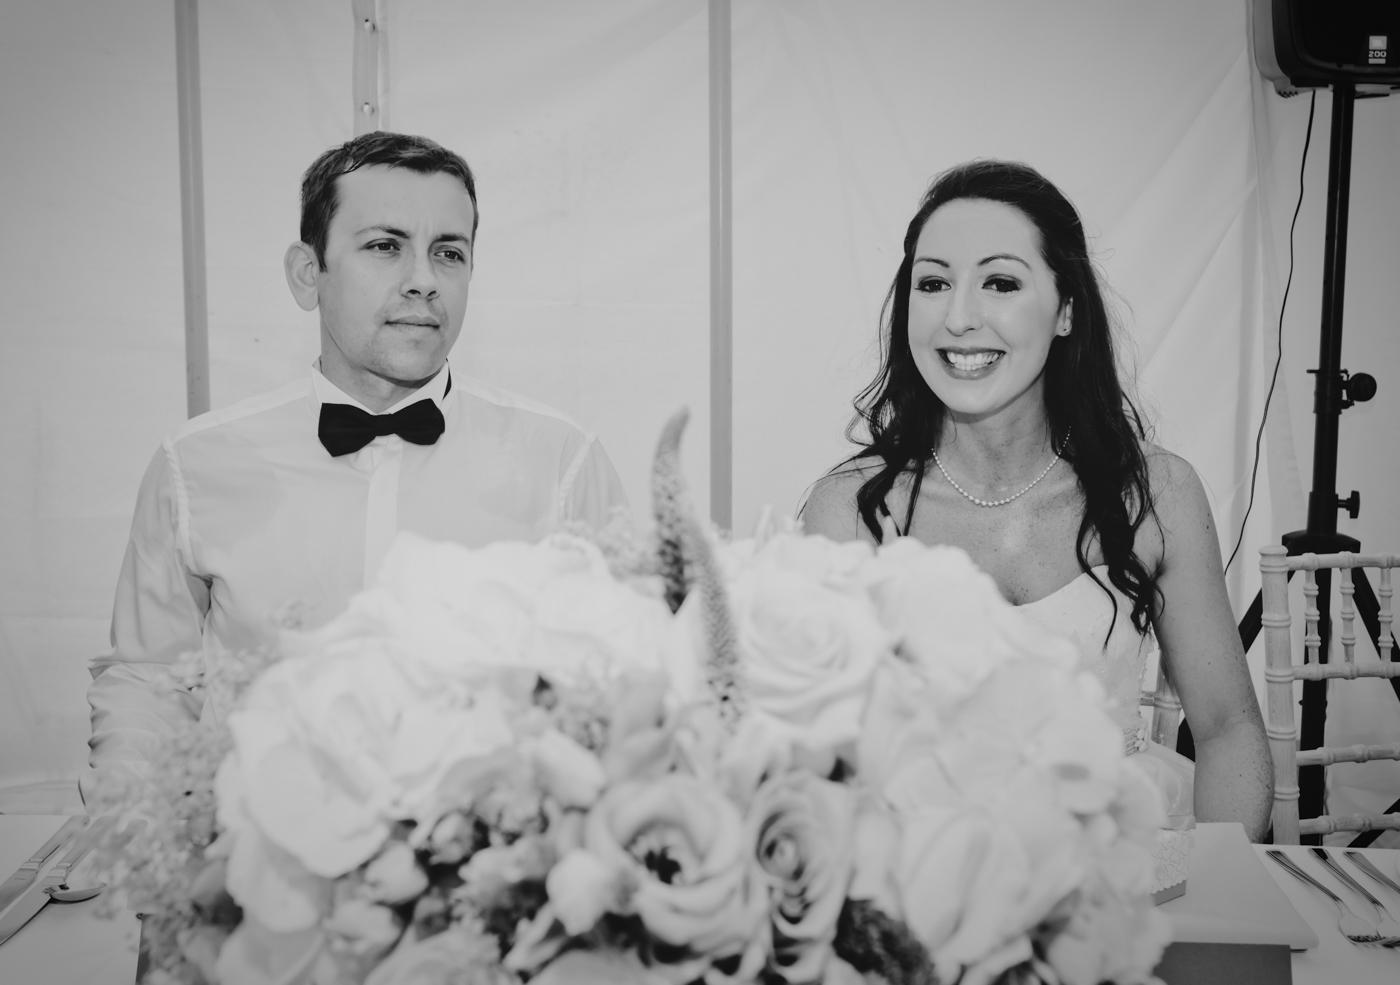 149 - Abi and Chris at Kedleston Hall - Wedding Photography by Mark Pugh www.markpugh.com - 0612.JPG